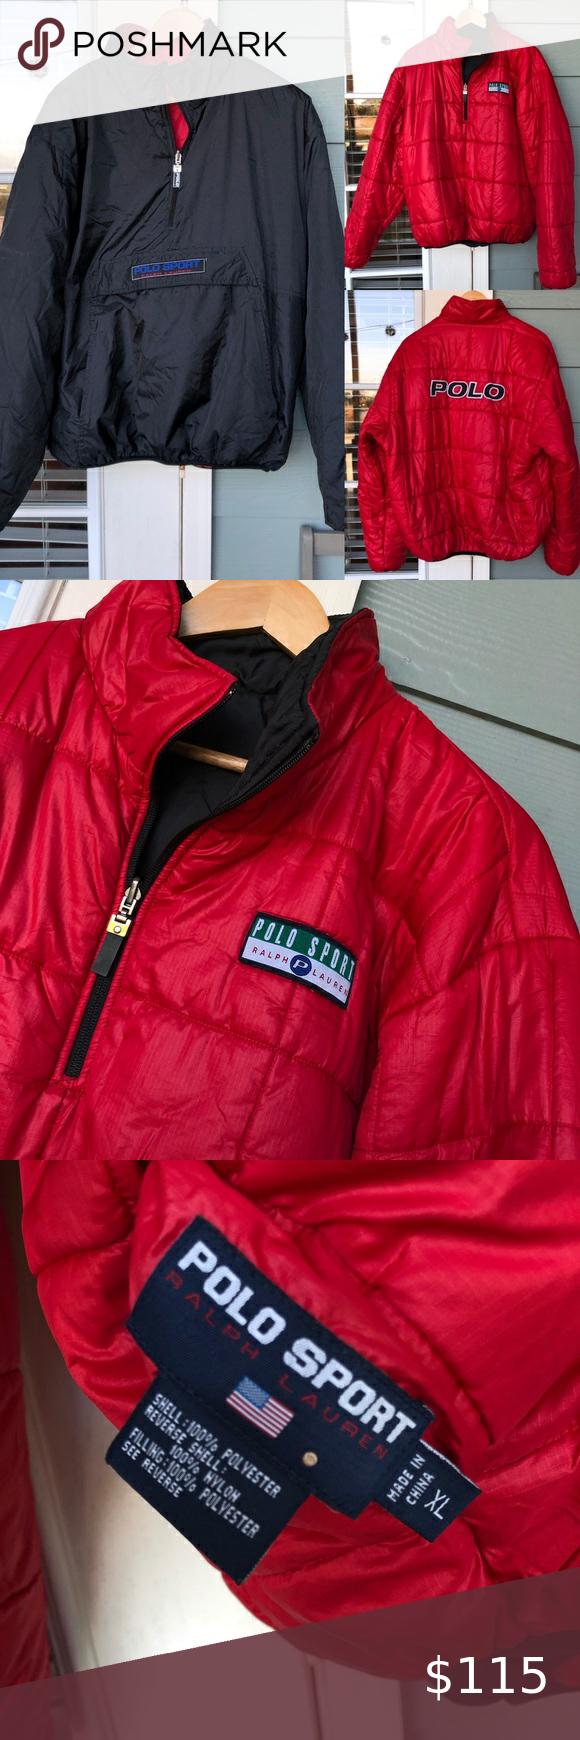 Polo Sport Reversible Puffer Coat Jacket Xl Puffer Coat Coats Jackets Jackets [ 1740 x 580 Pixel ]